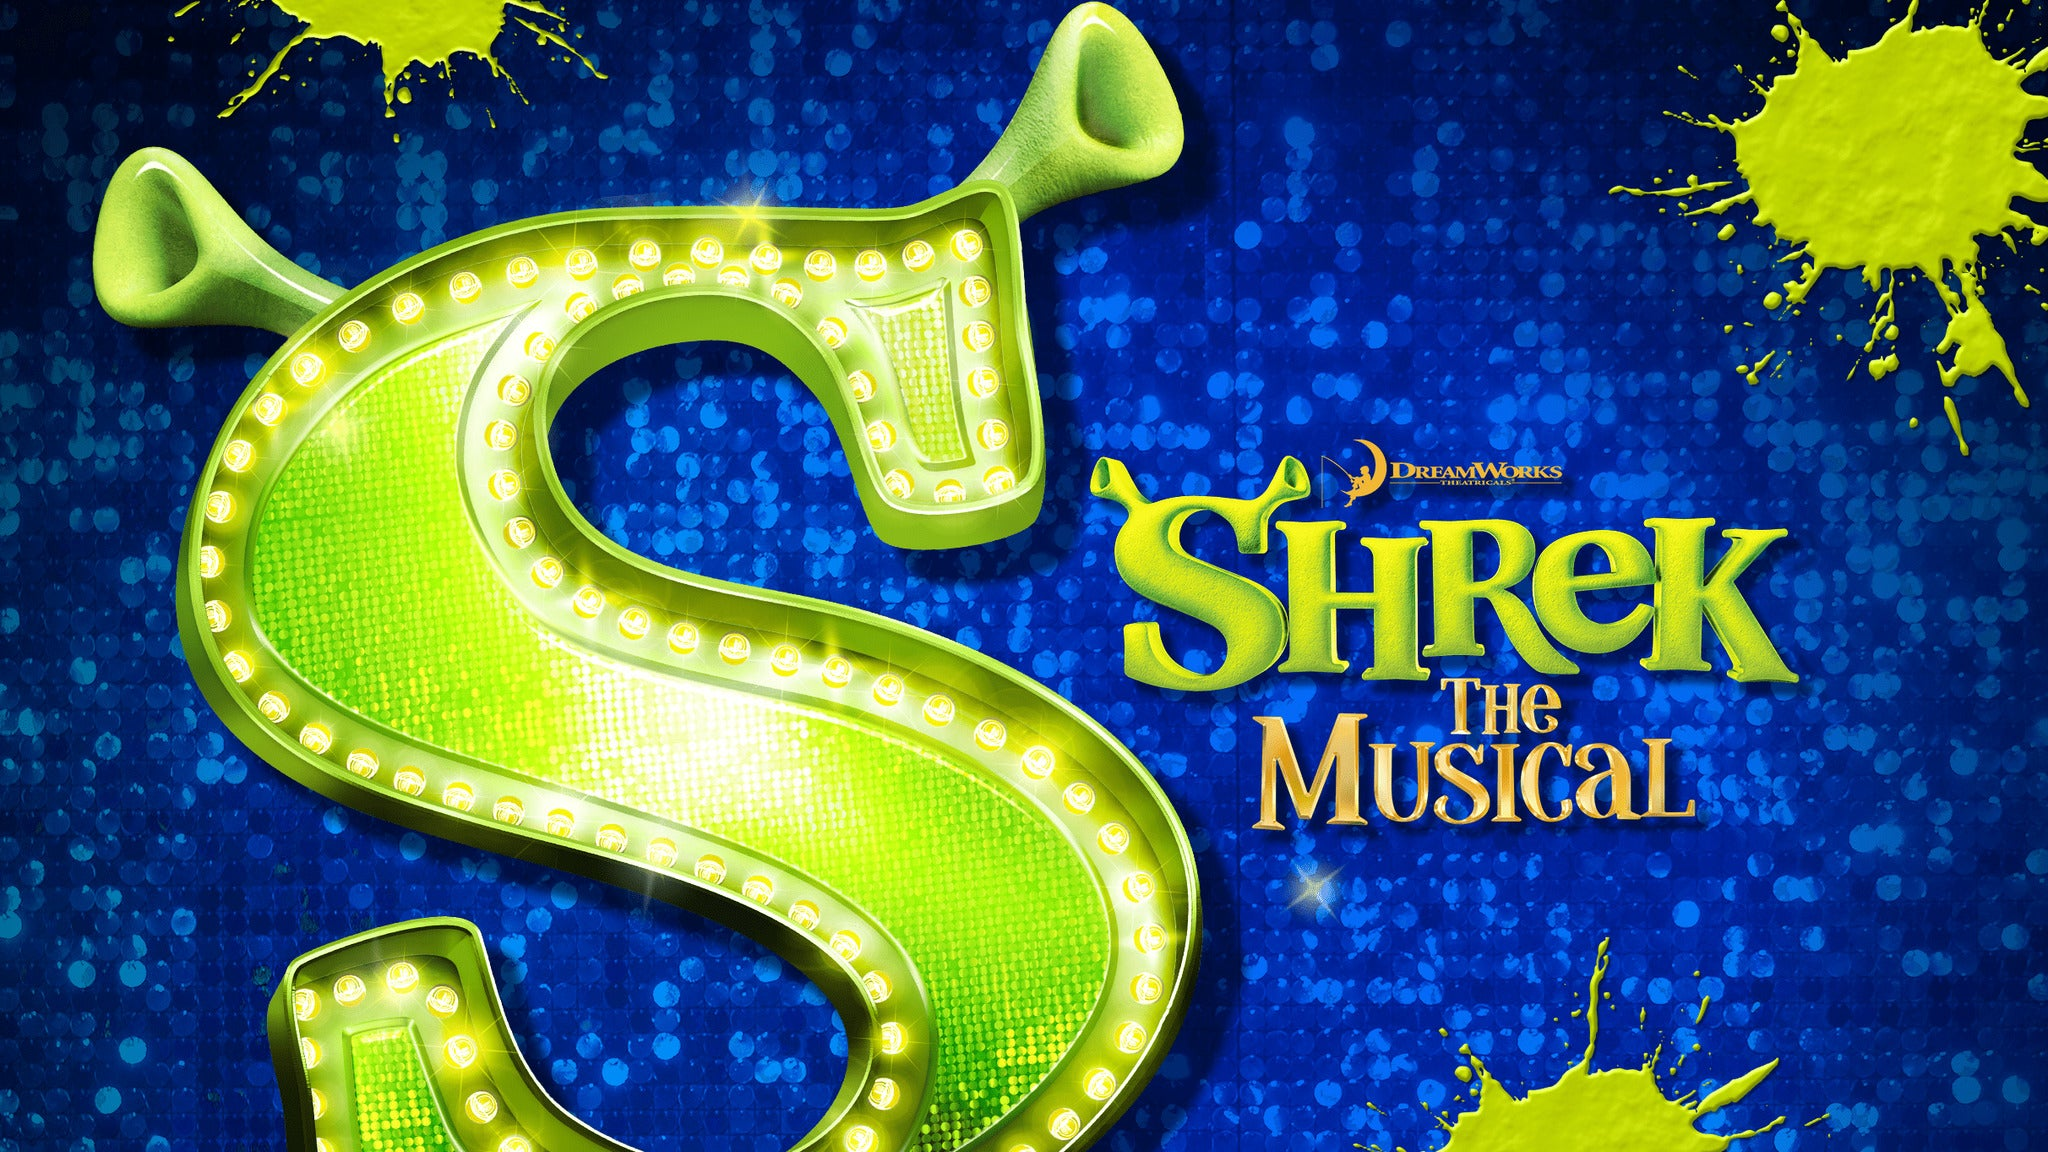 NYTC presents Shrek the Musical